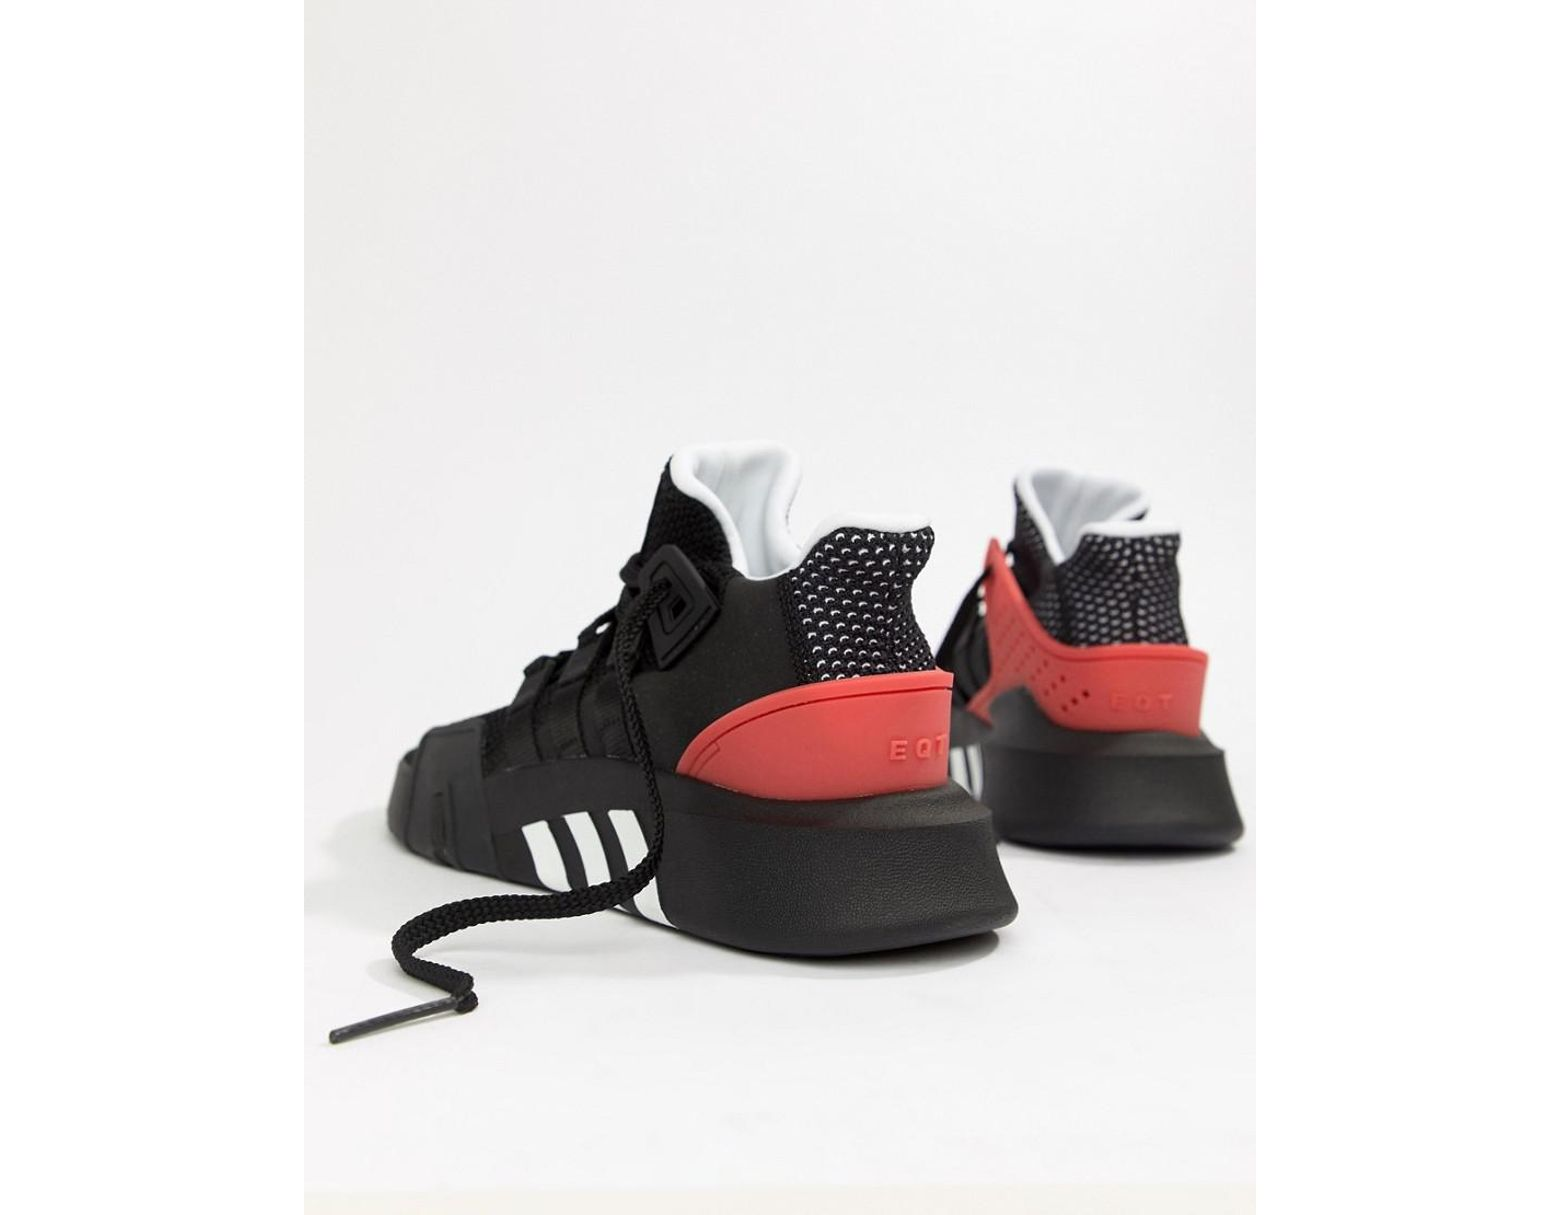 71bfb9f8a270 adidas Originals Eqt Bask Adv Sneakers In Black Aq1013 in Black for Men -  Lyst